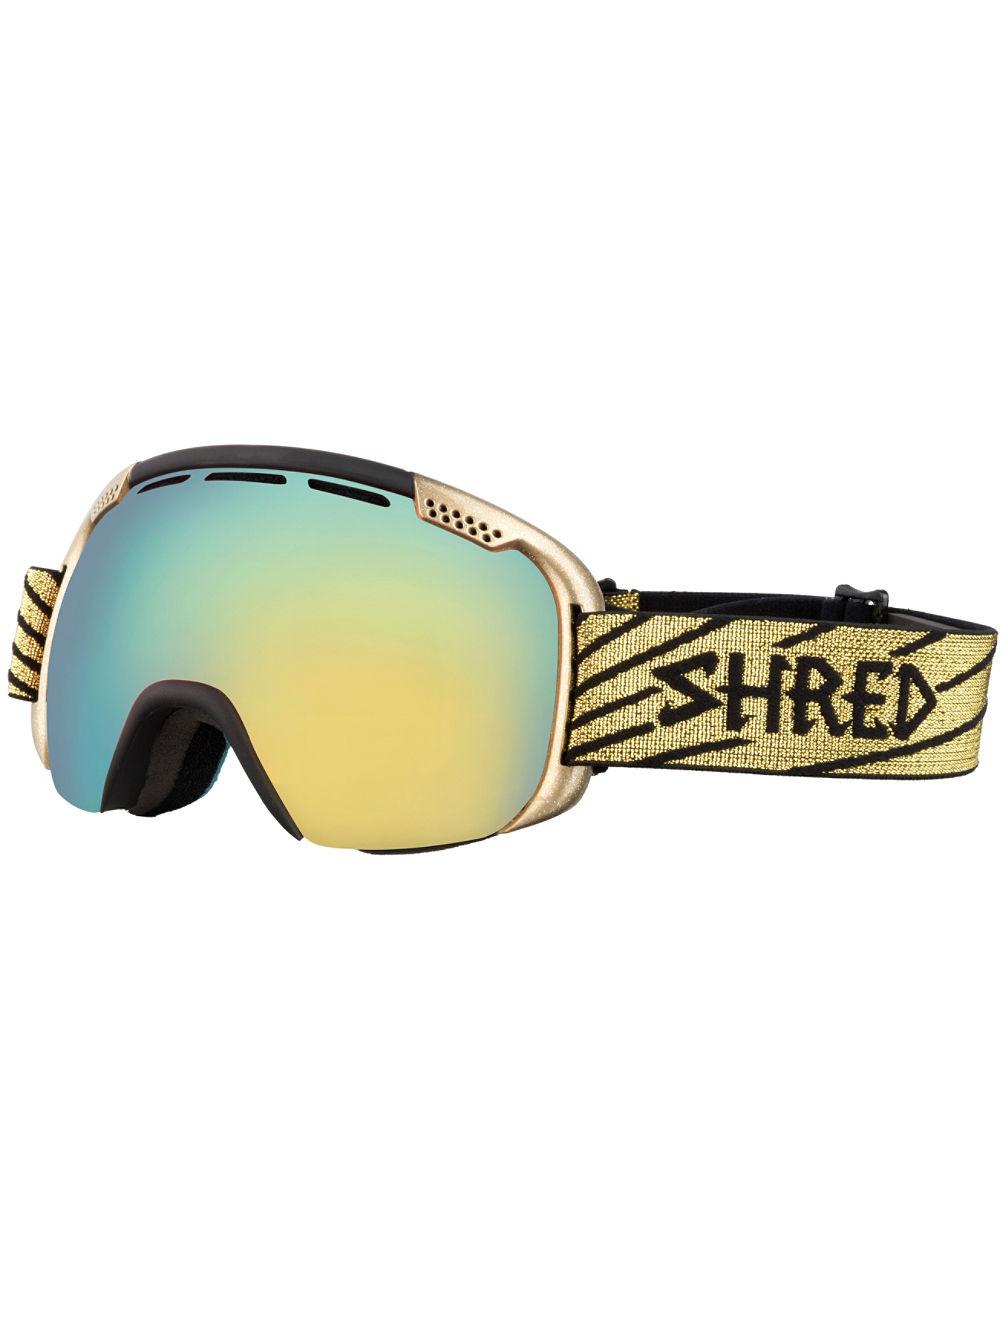 shred maschera  Compra Shred Smartefy Lg Cbl/Hero Maschera online su